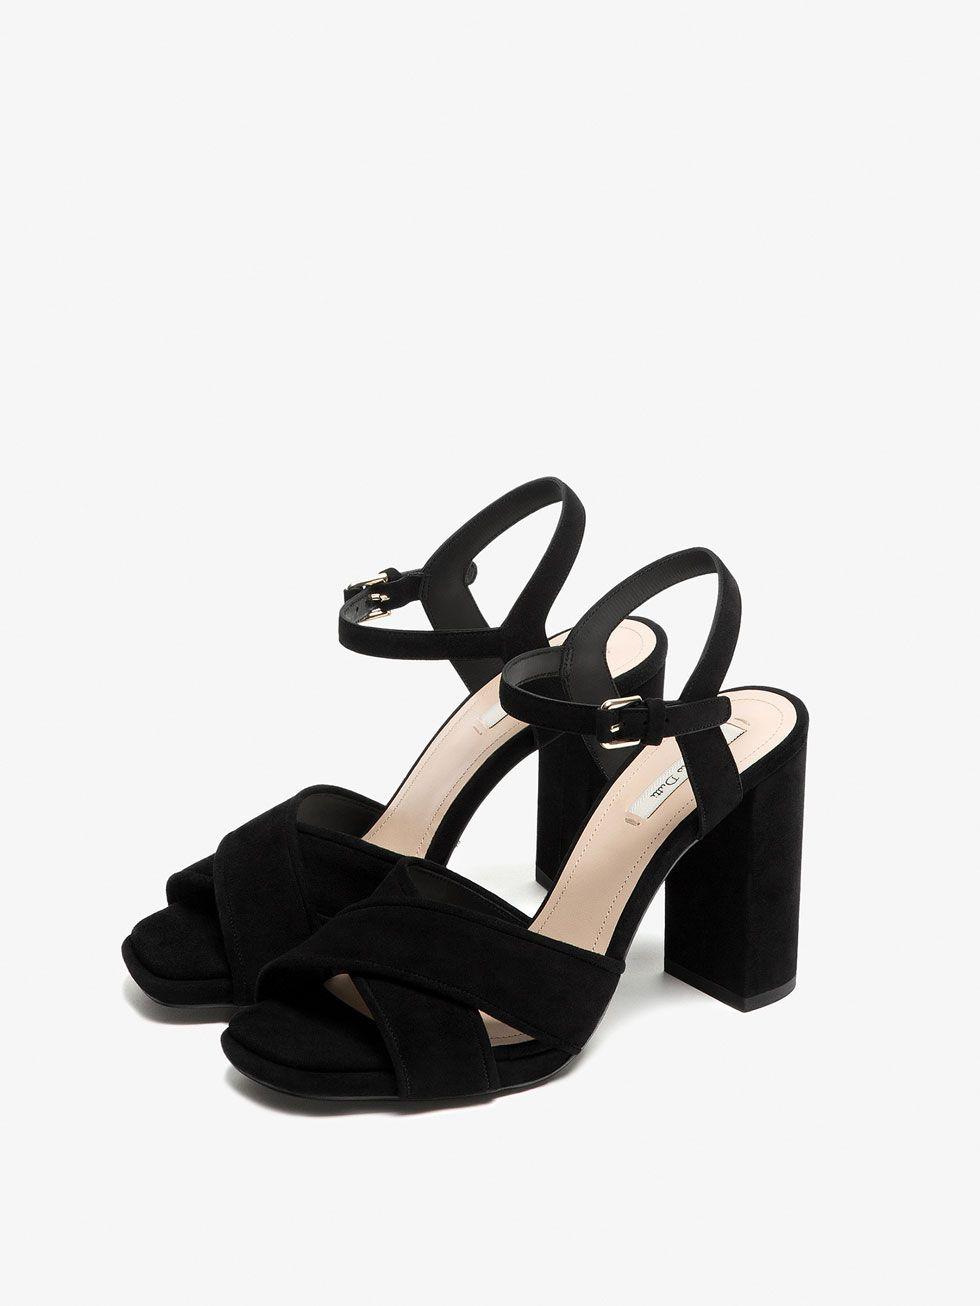 Zapatos Ante Ver Mujer Negro De Sandalia Cruzada Todo Piel ukZiPX